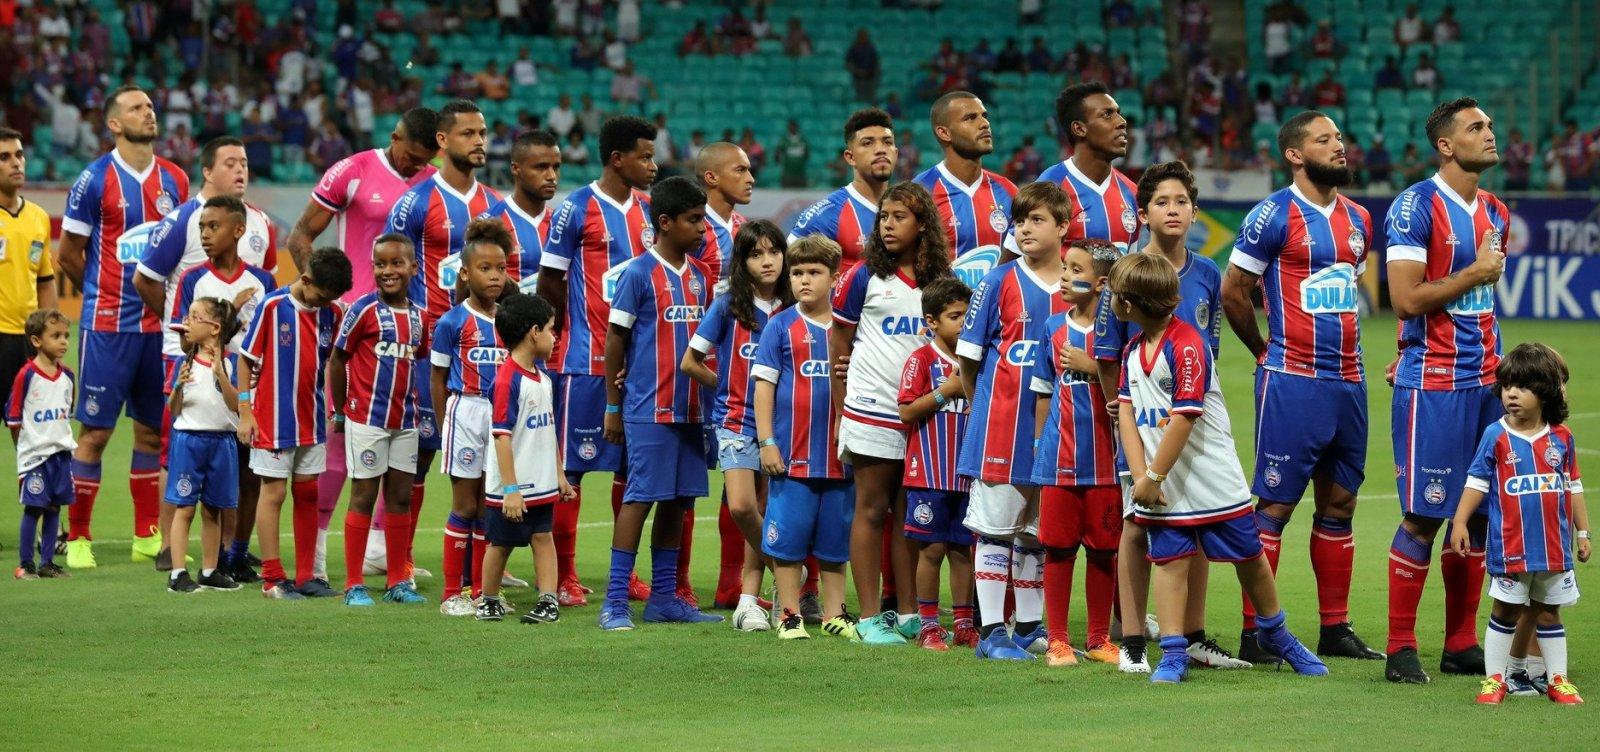 Bahia vai enfrentar o Londrina na quarta fase da Copa do Brasil